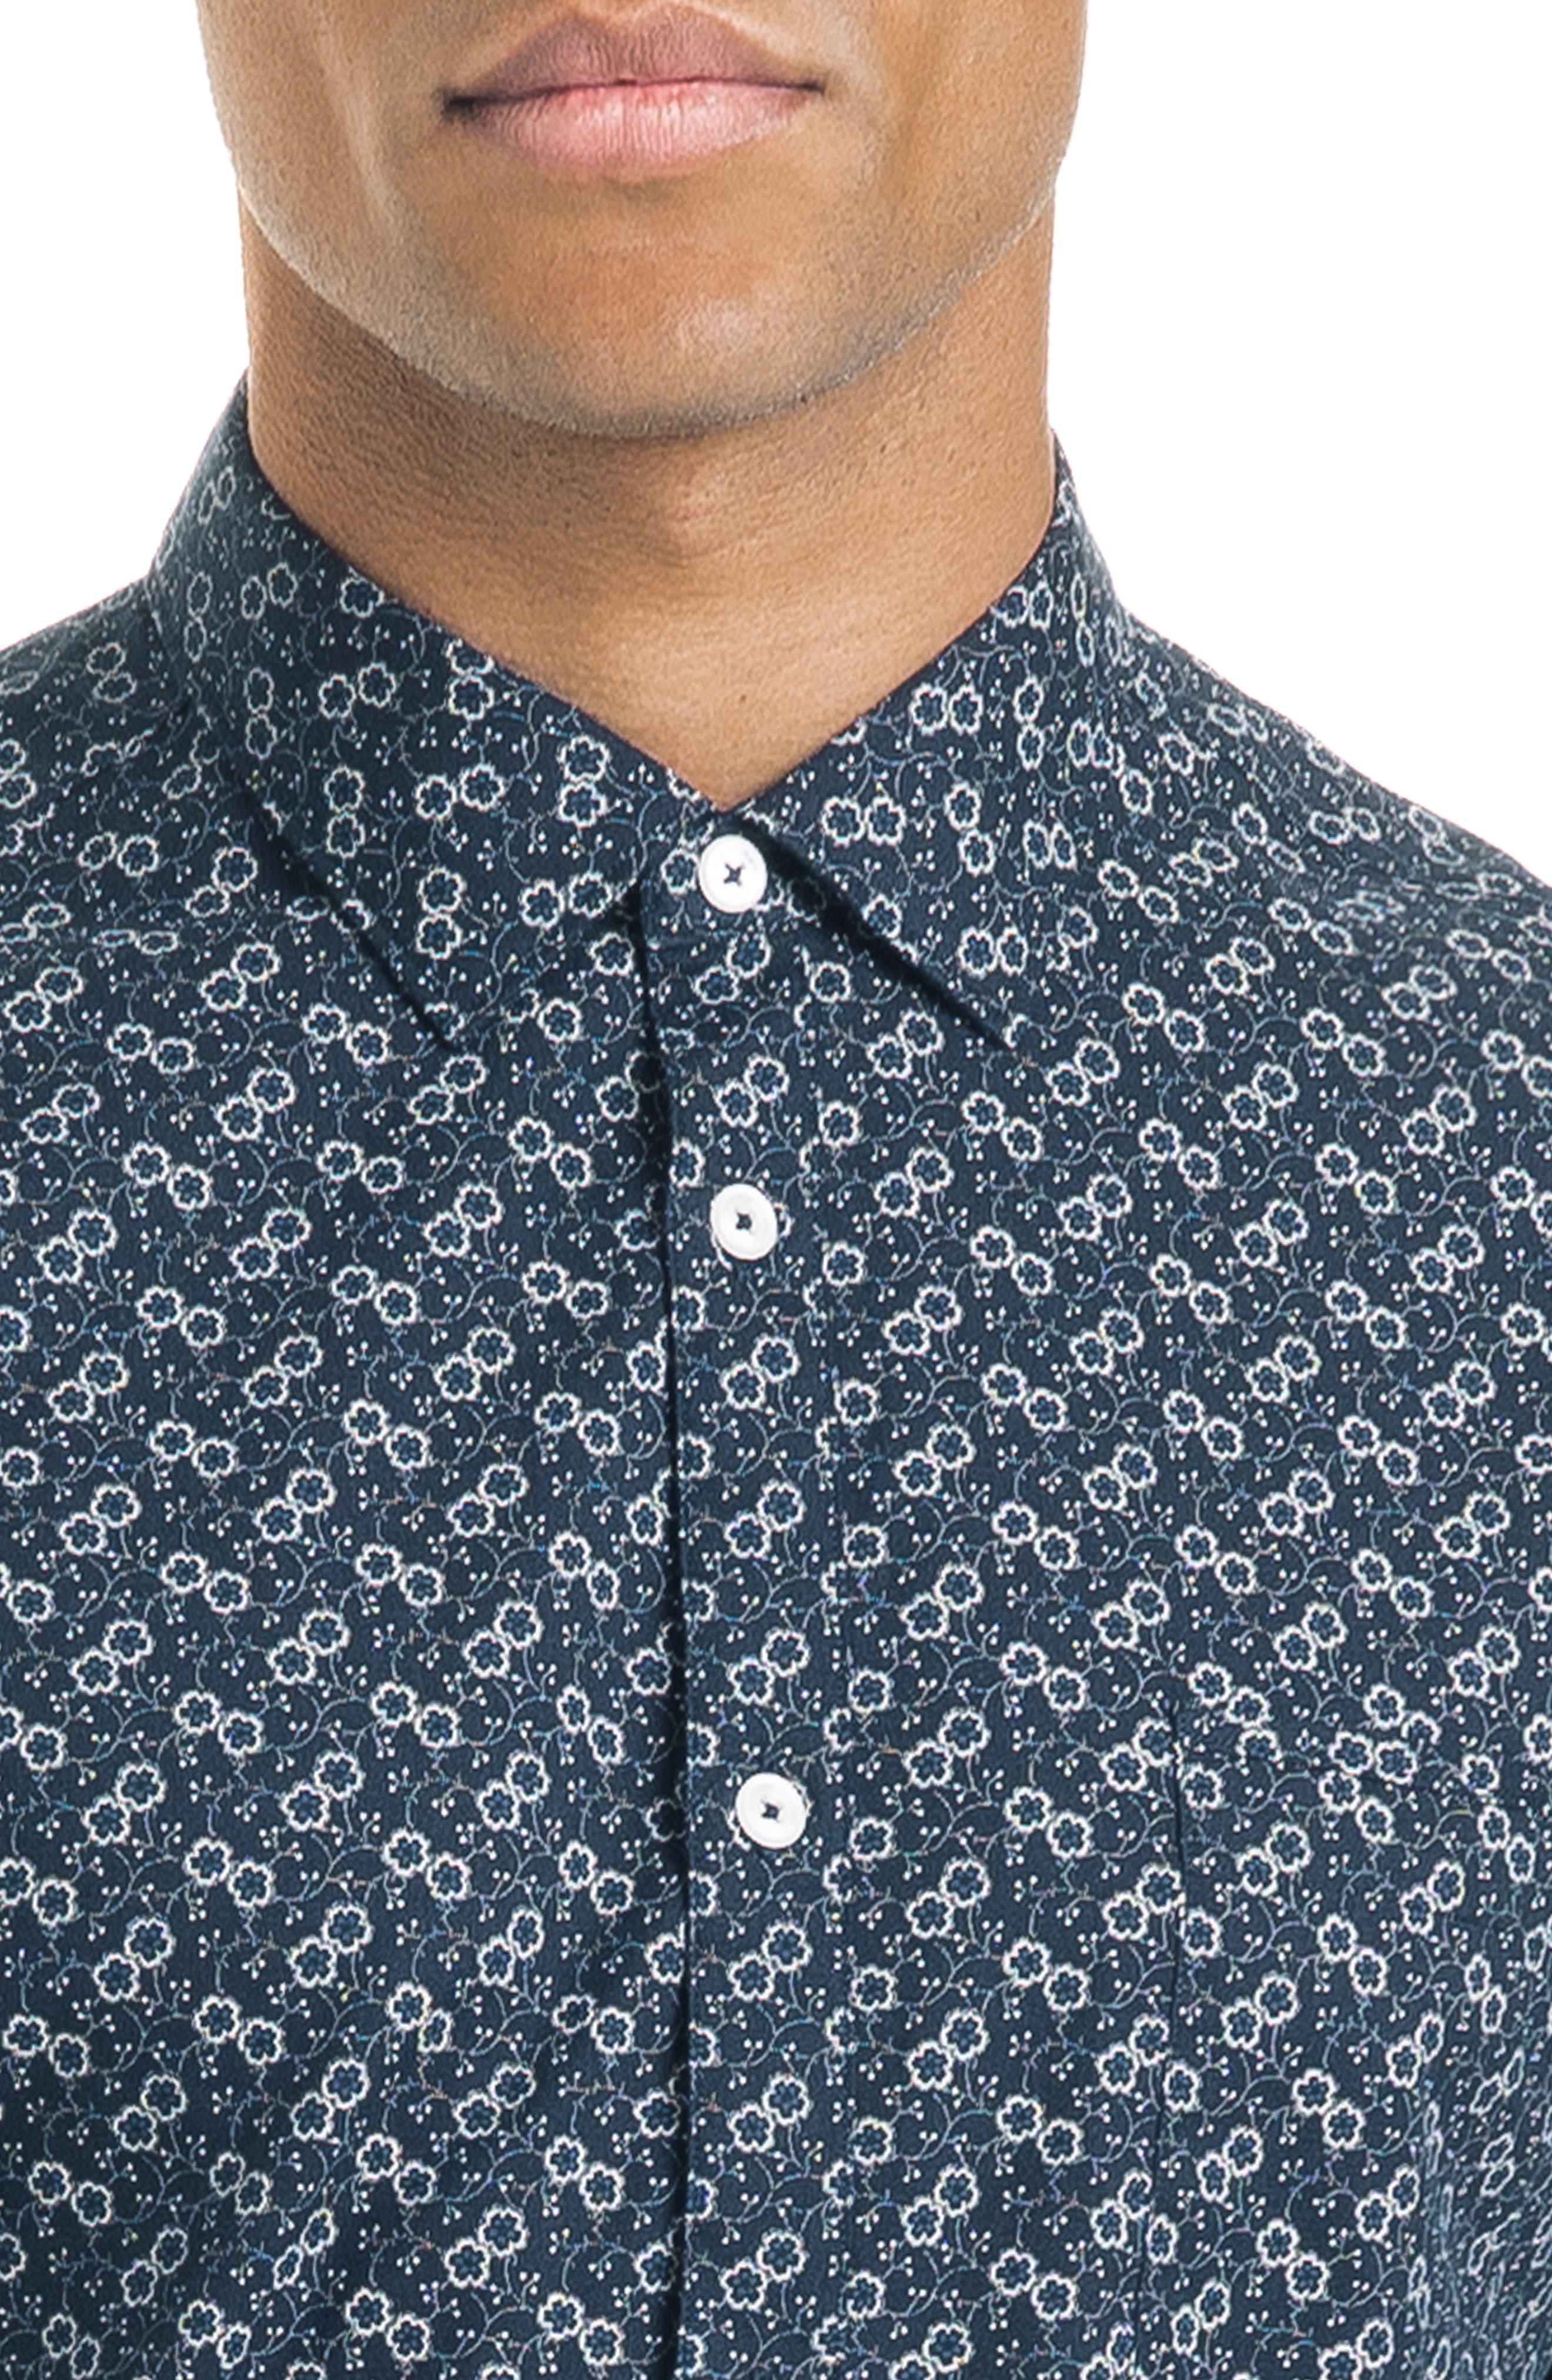 Floral Dot Slim Fit Sport Shirt,                             Alternate thumbnail 4, color,                             NAVY